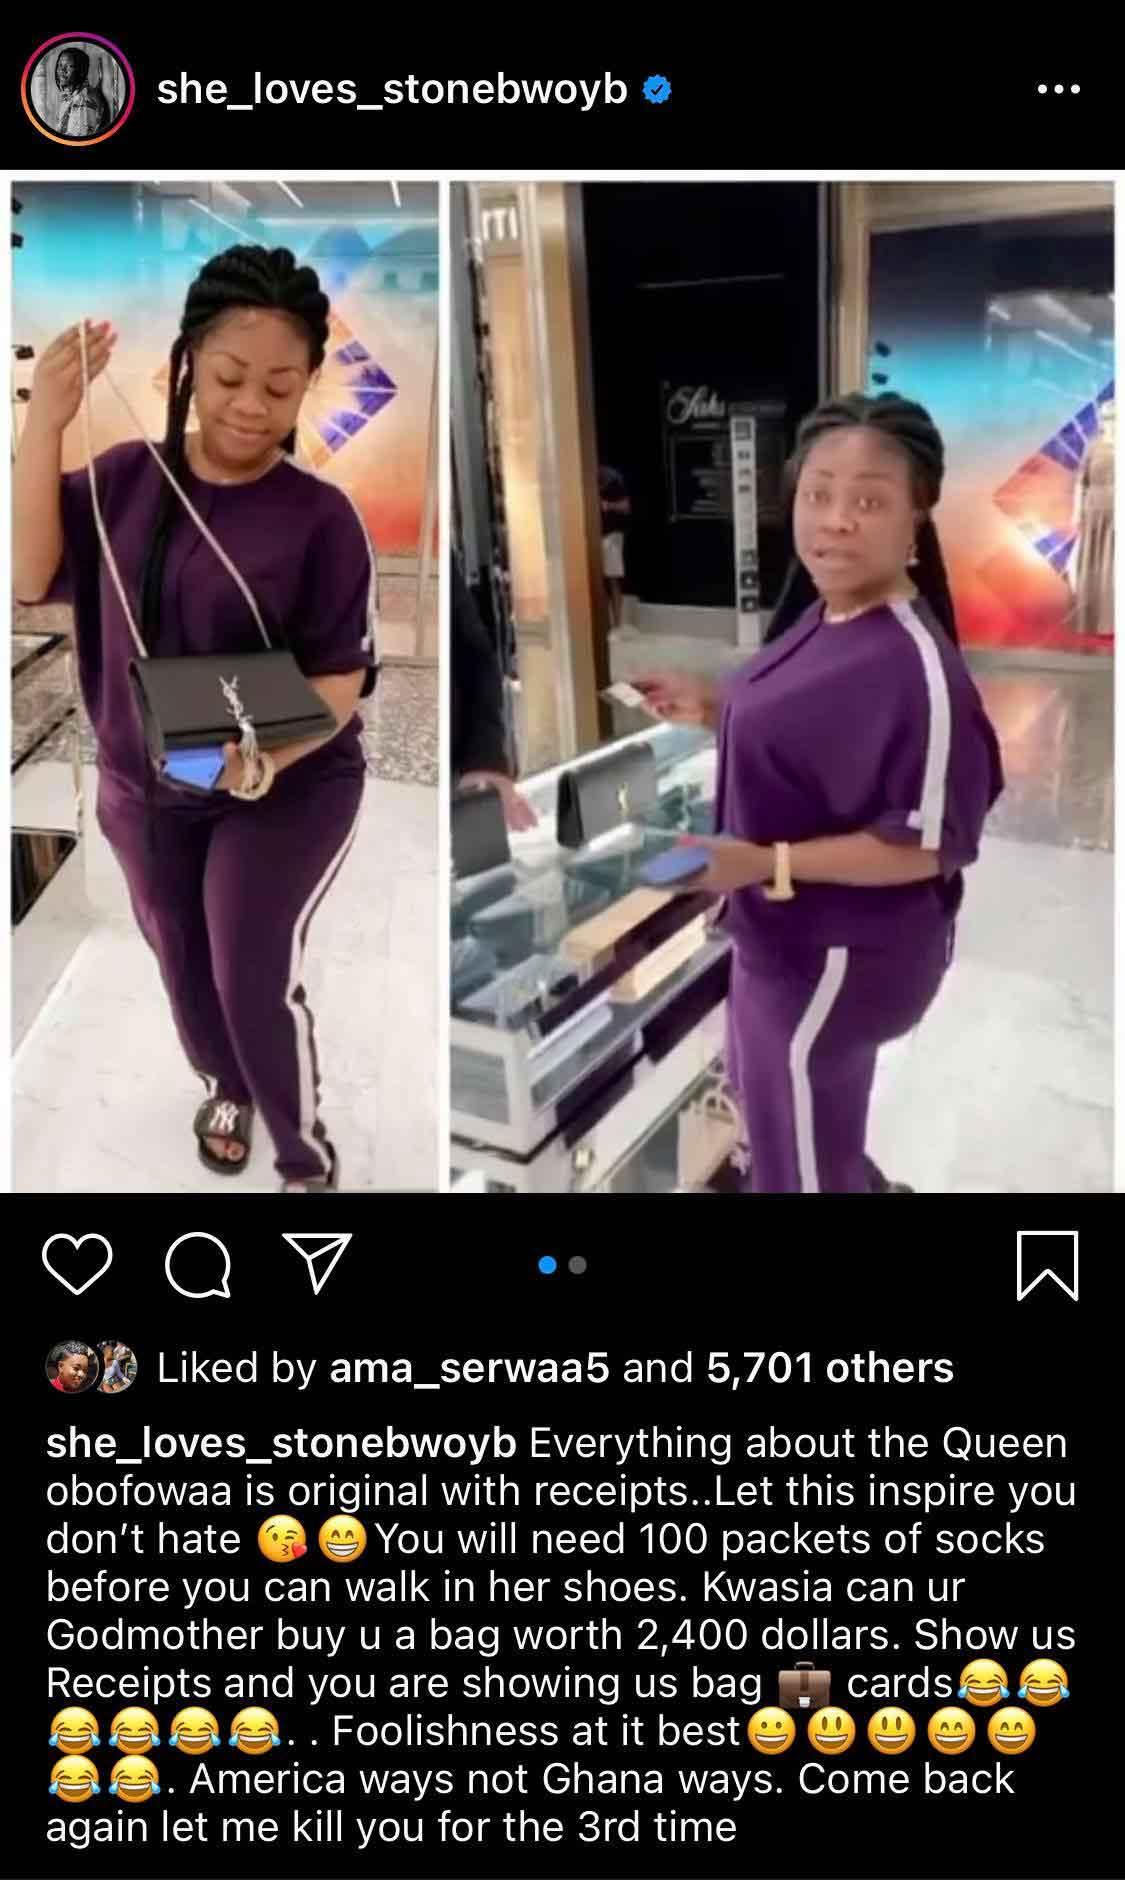 Obofowaa buys a bag with $2400 for Ayisha Modi